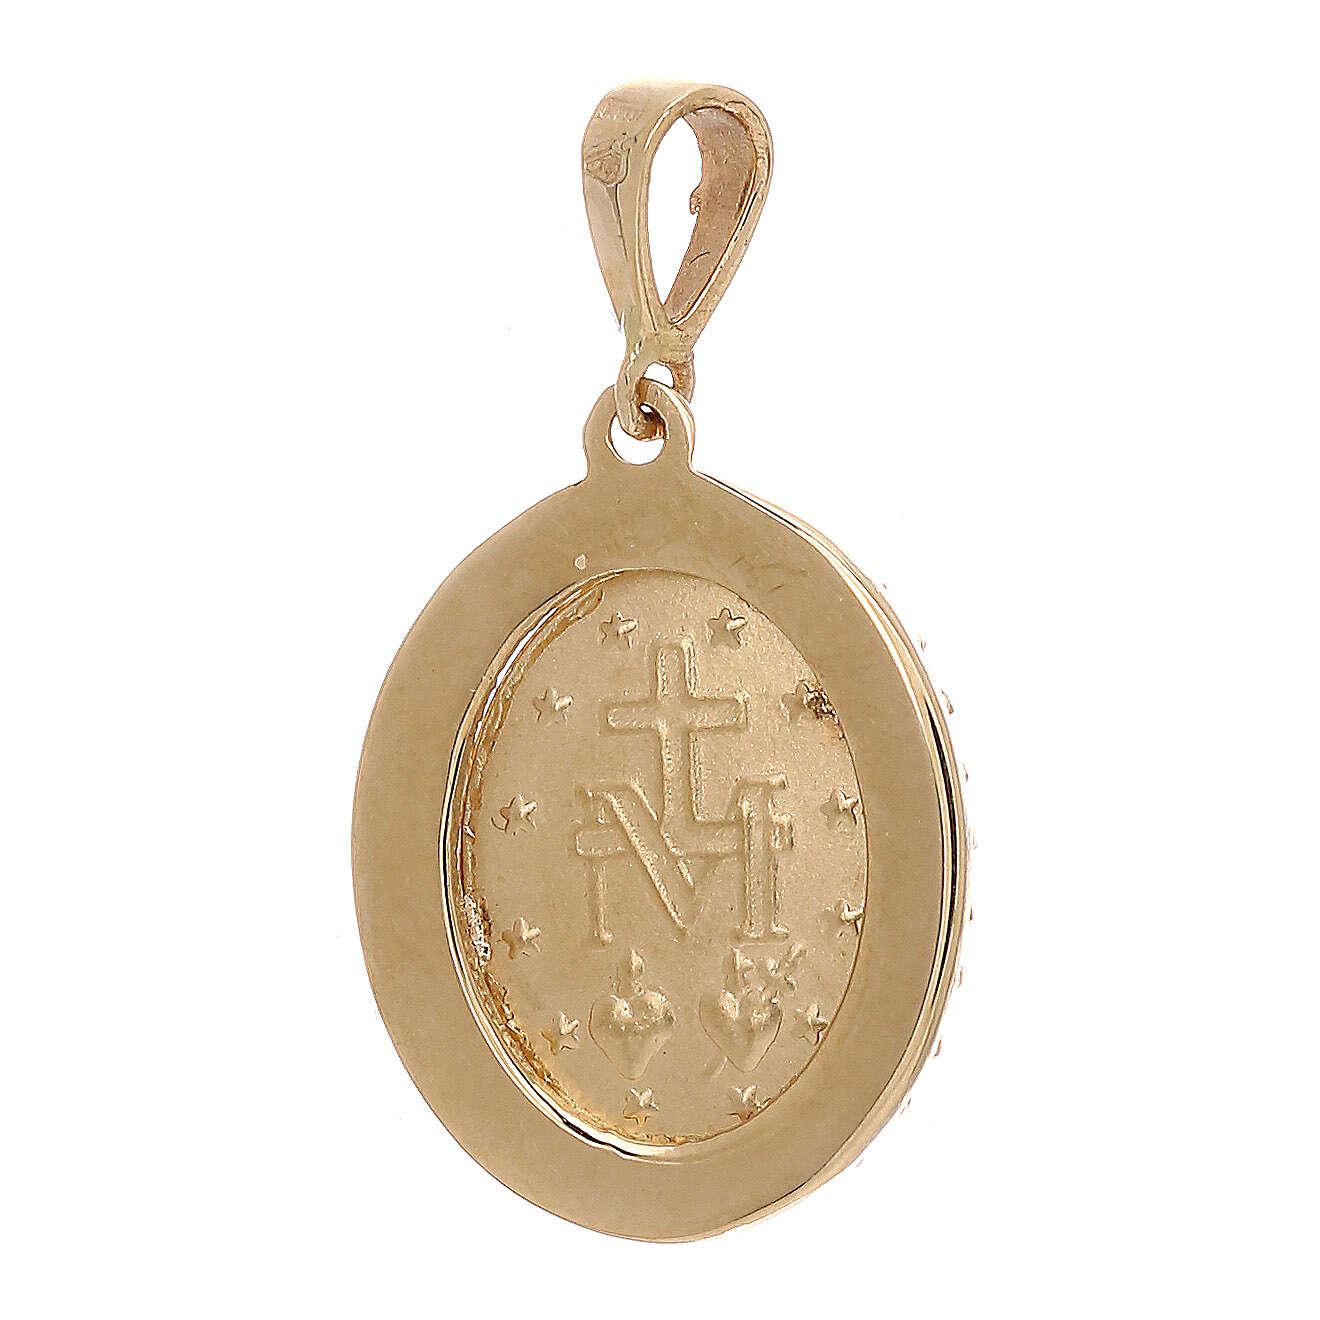 Pendentif Médaille Miraculeuse or jaune Swarovski 2,6 gr 4